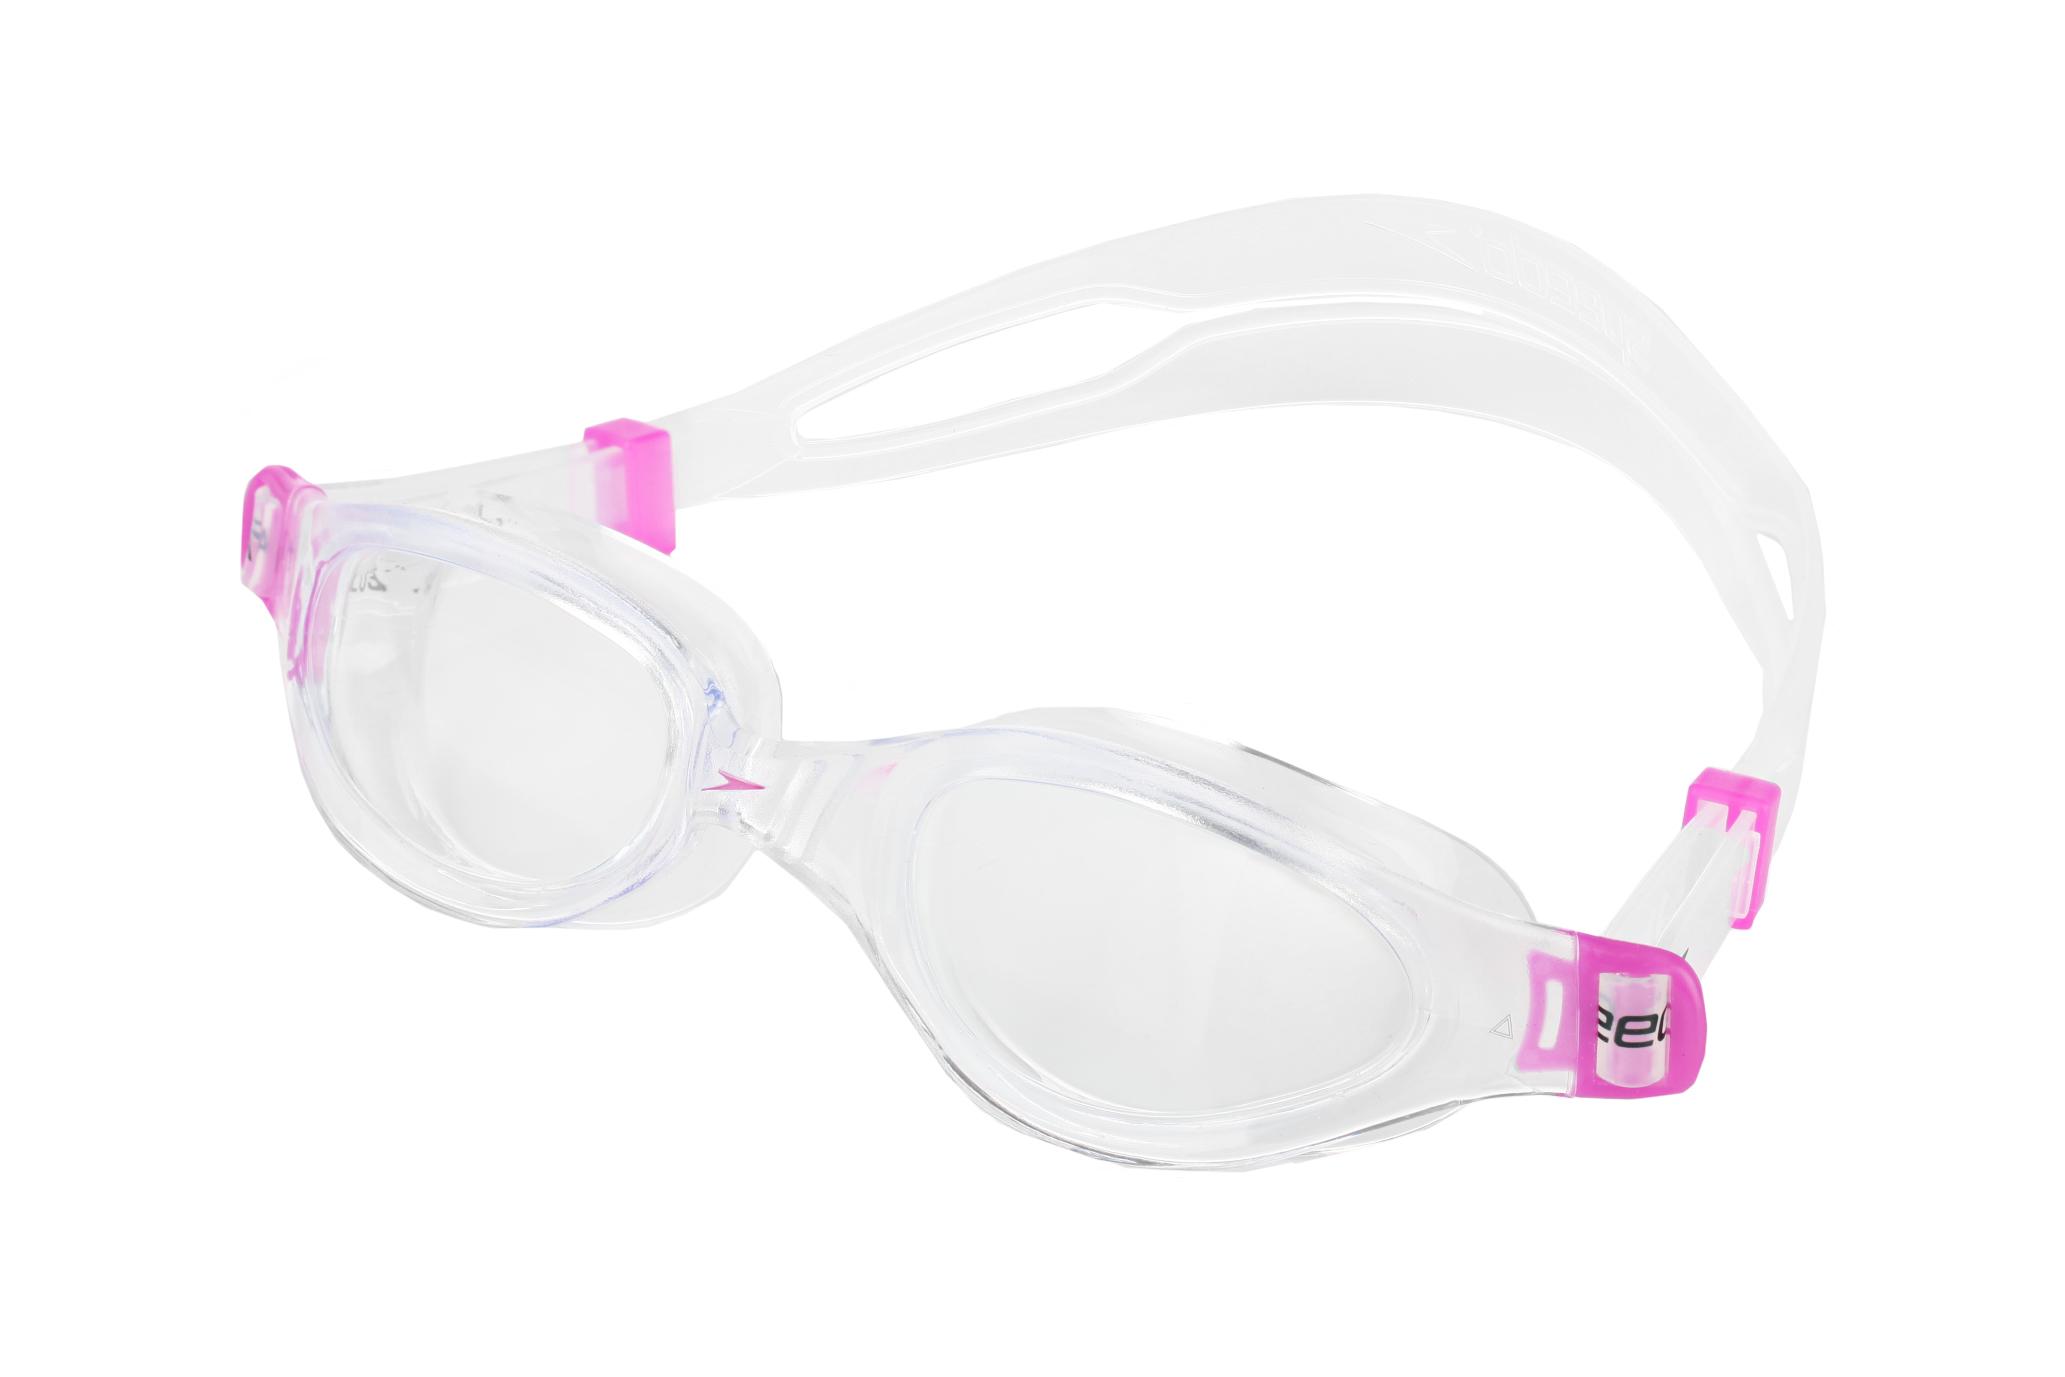 Speedo Очки для плавания детские Speedo Futura Plus, размер Без размера очки для плавания speedo mariner mirror junior цвет розовый прозрачный